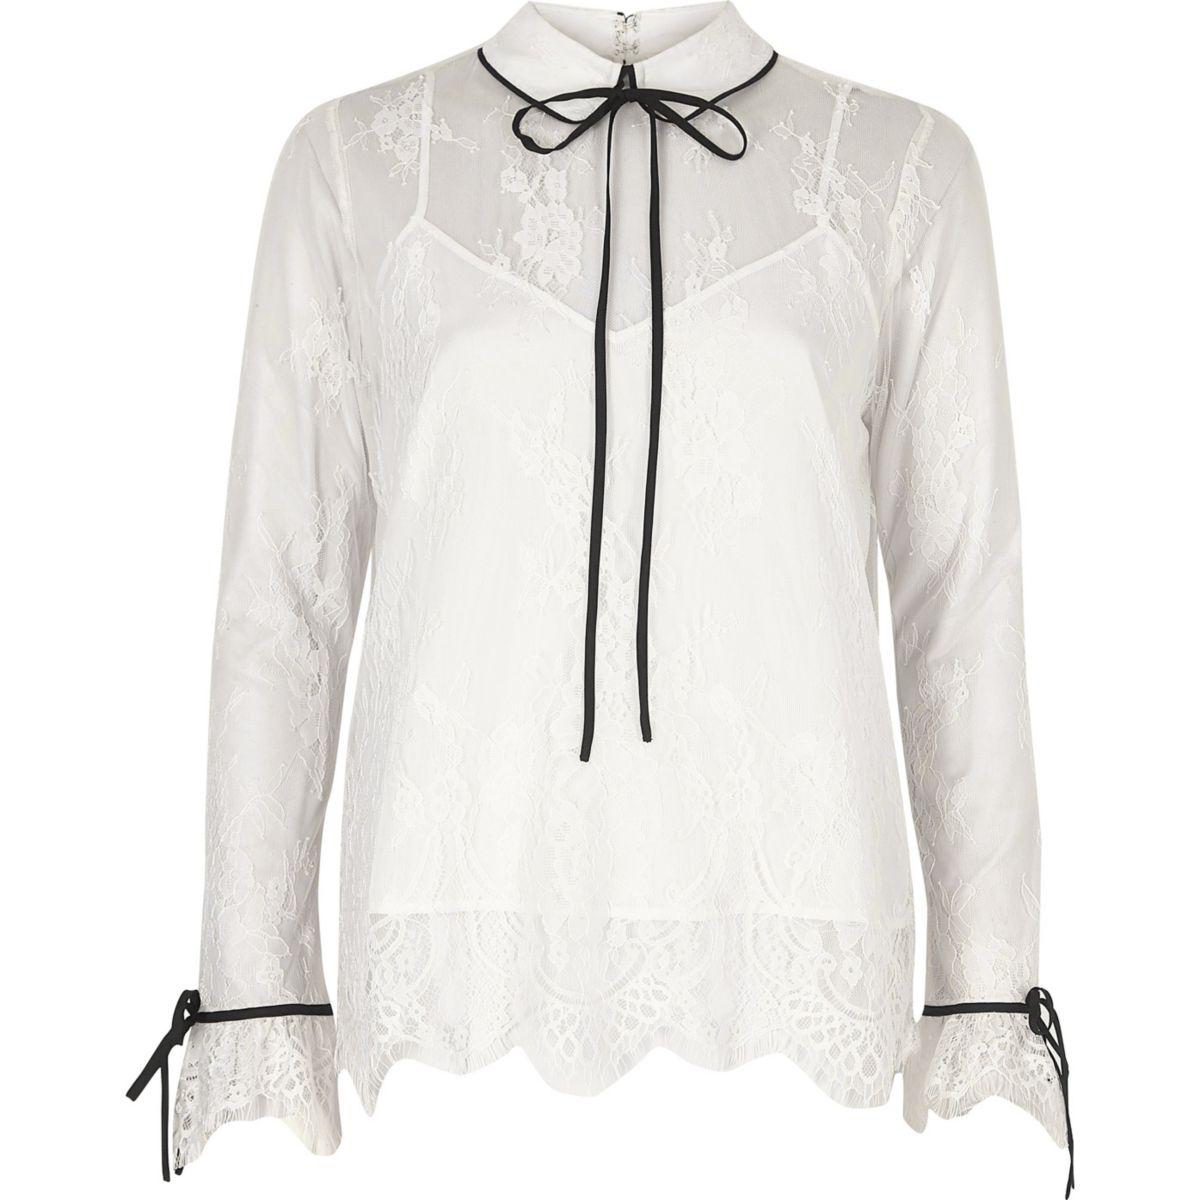 White lace frill tie neck blouse